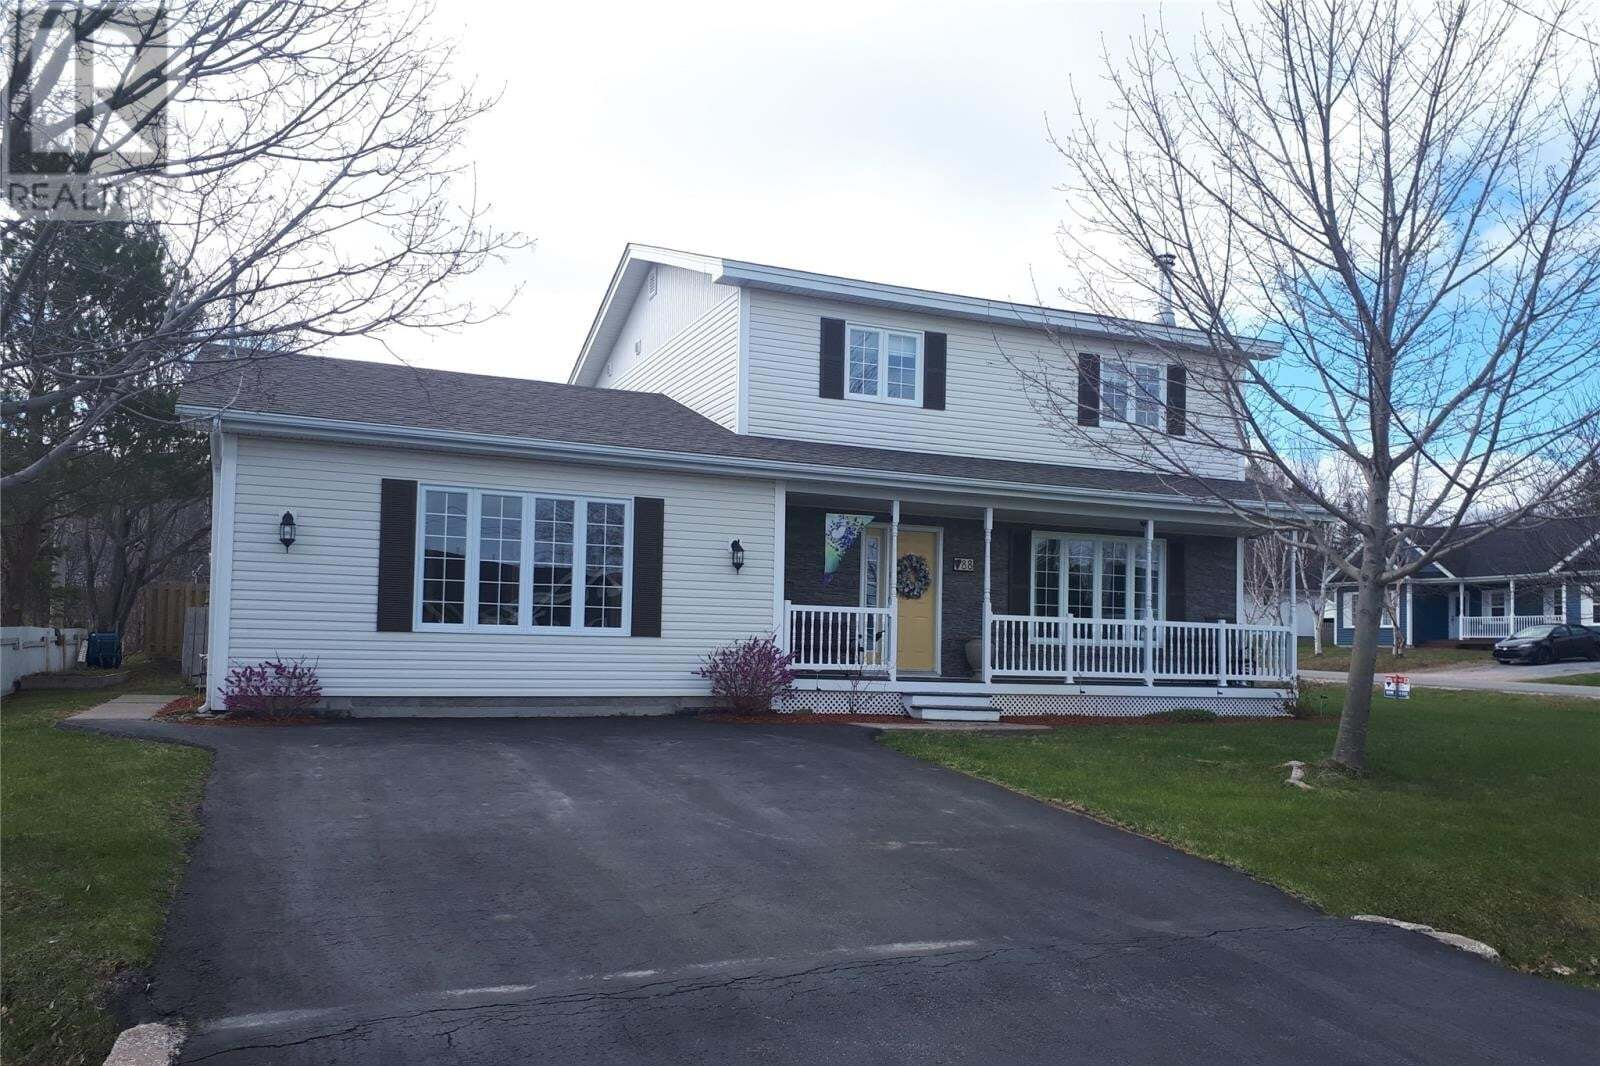 House for sale at 88 Tamarack Ave Pasadena Newfoundland - MLS: 1212265